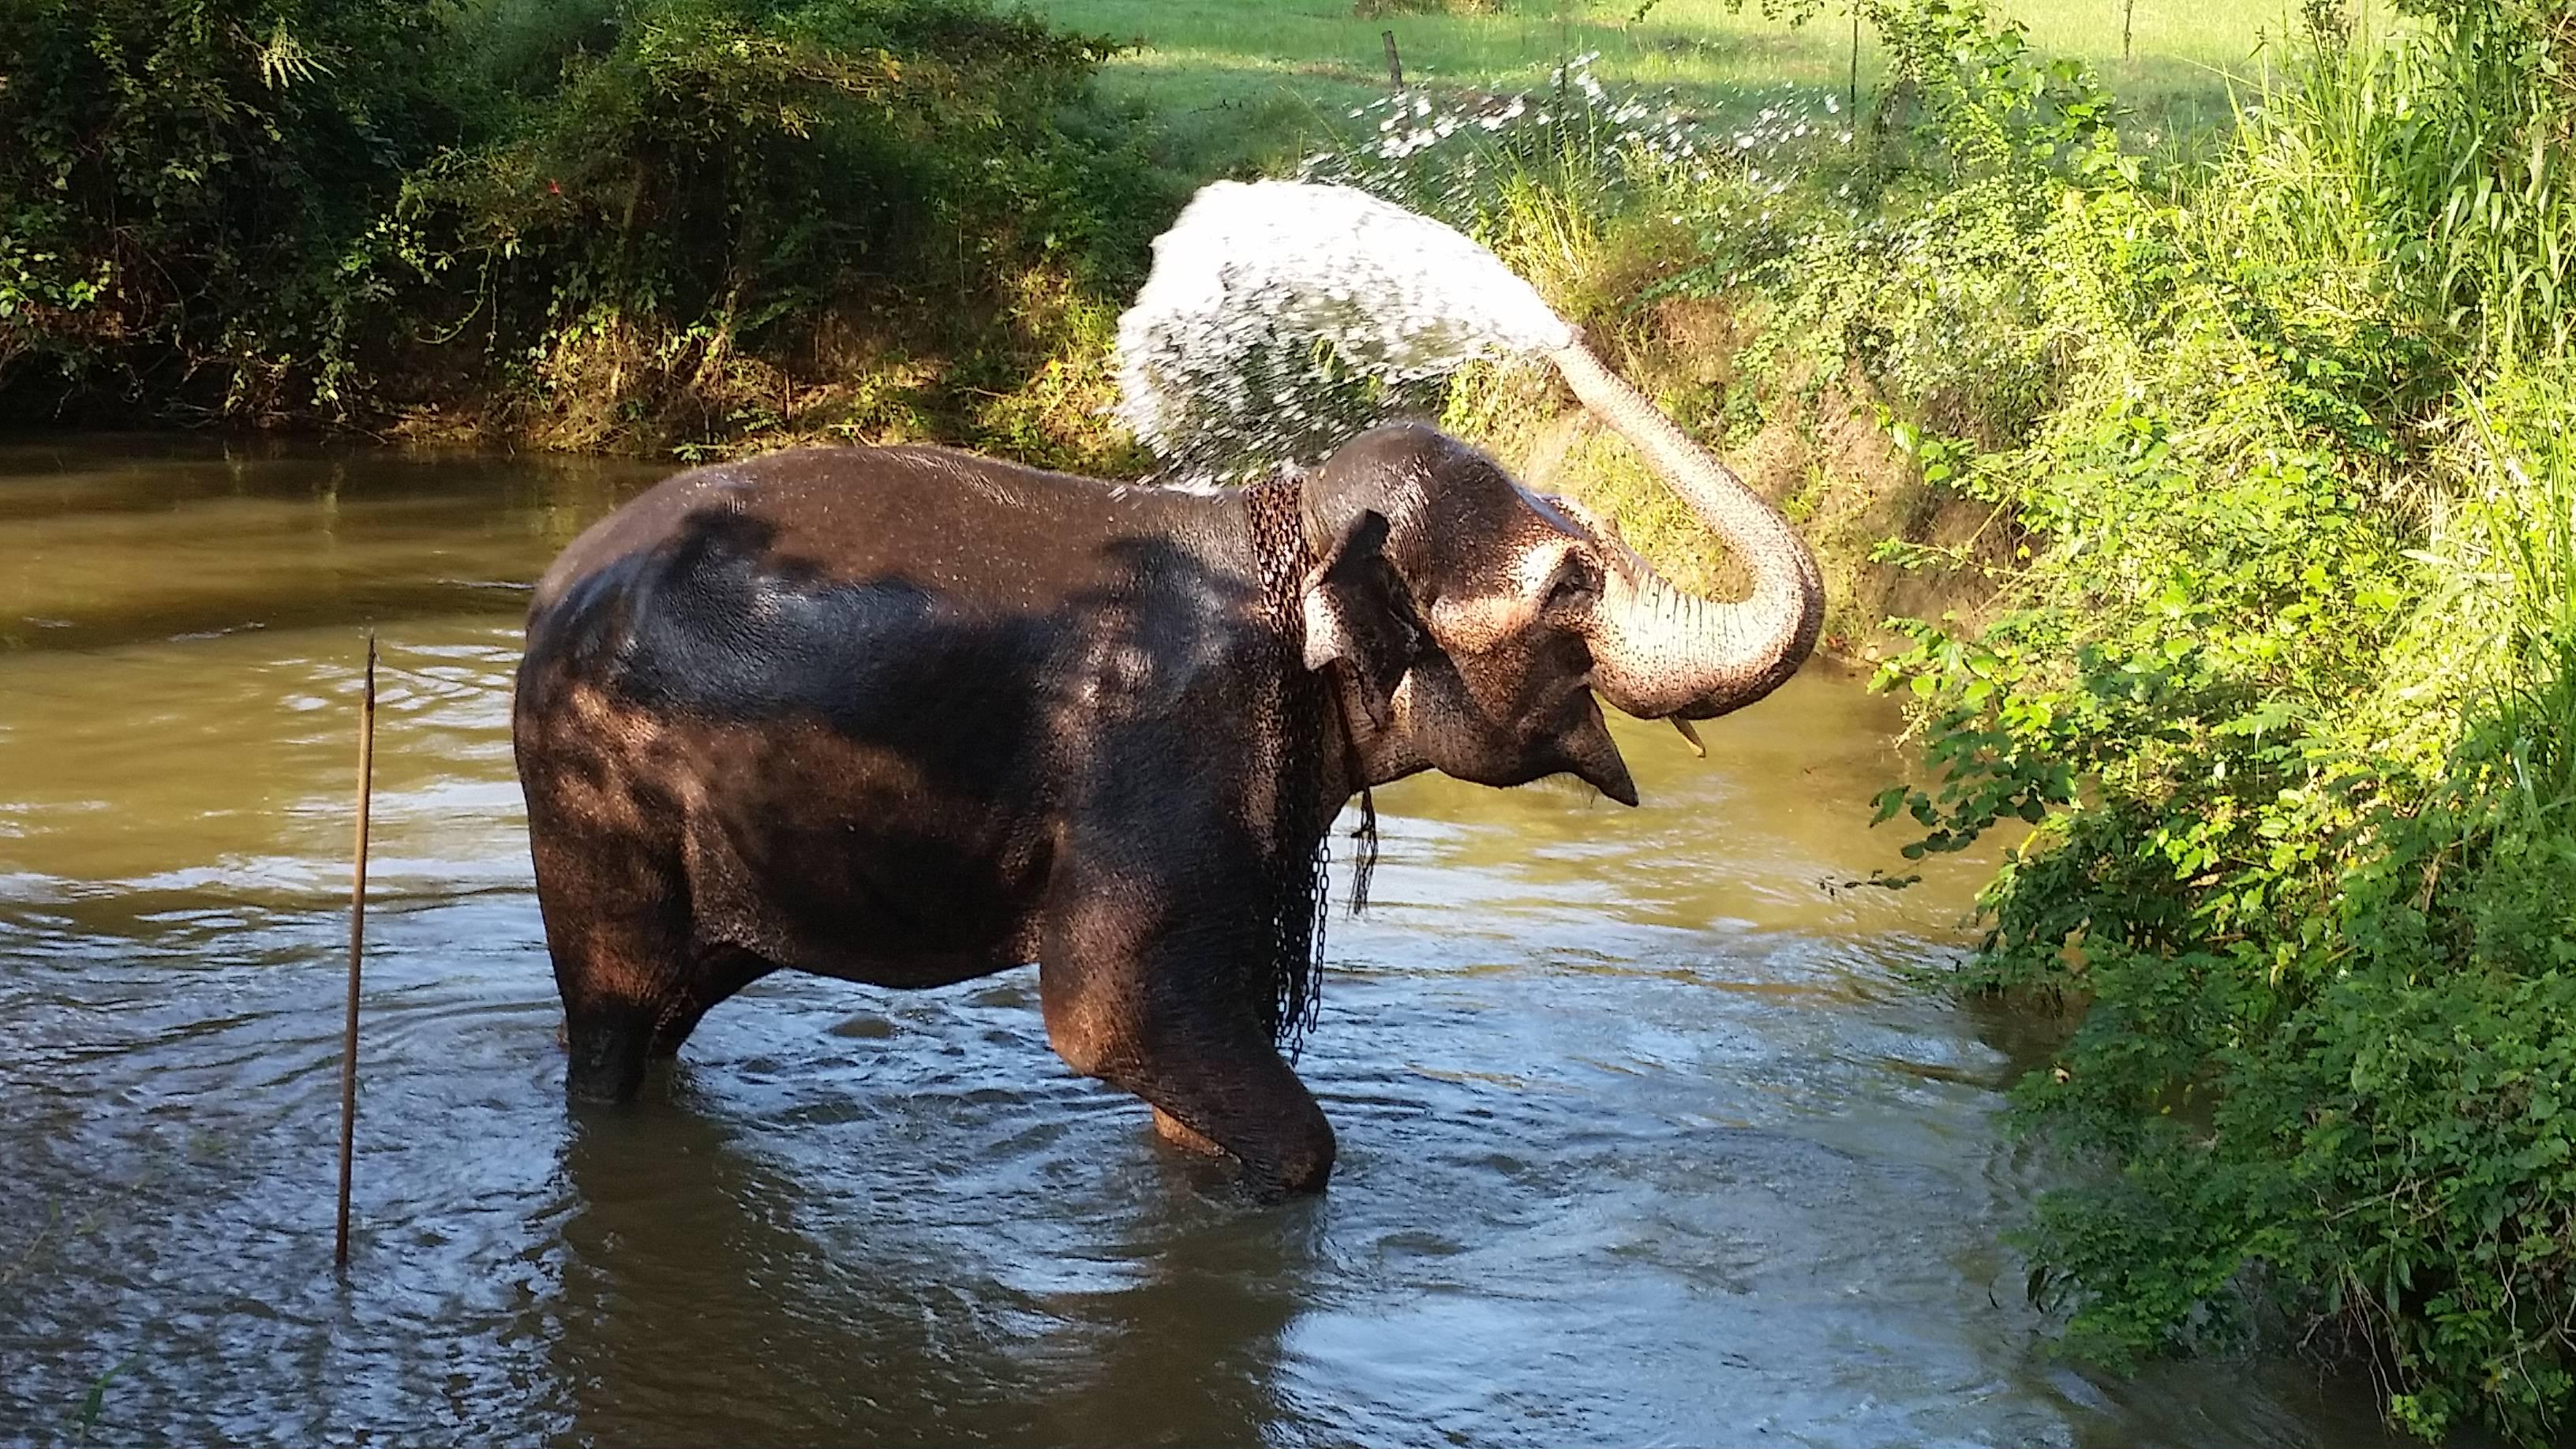 Sri Lanka Travel: Things not to do